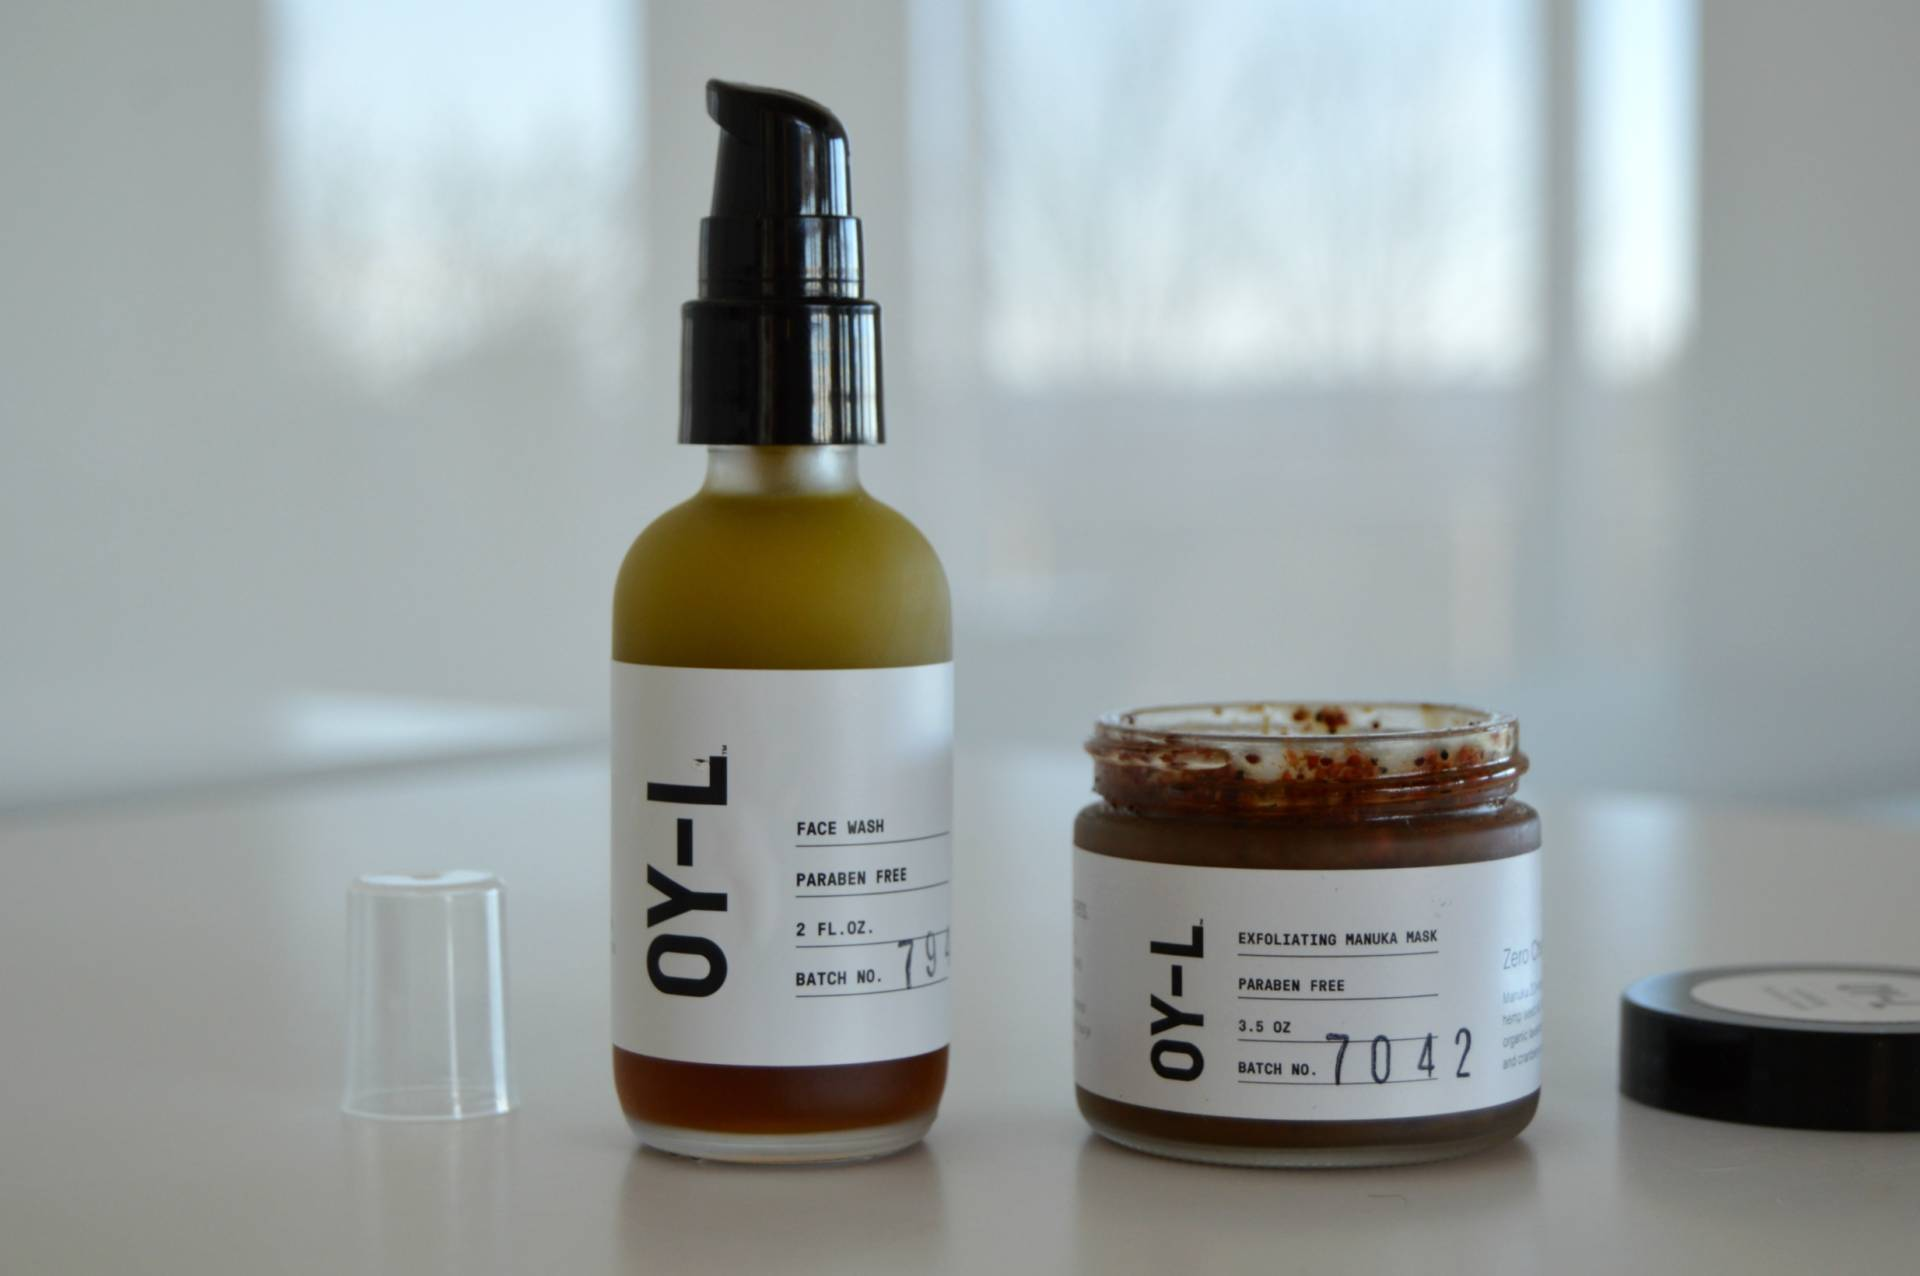 oy-l-face-wash-manuka-mask-skincare-review-inhautepursuit